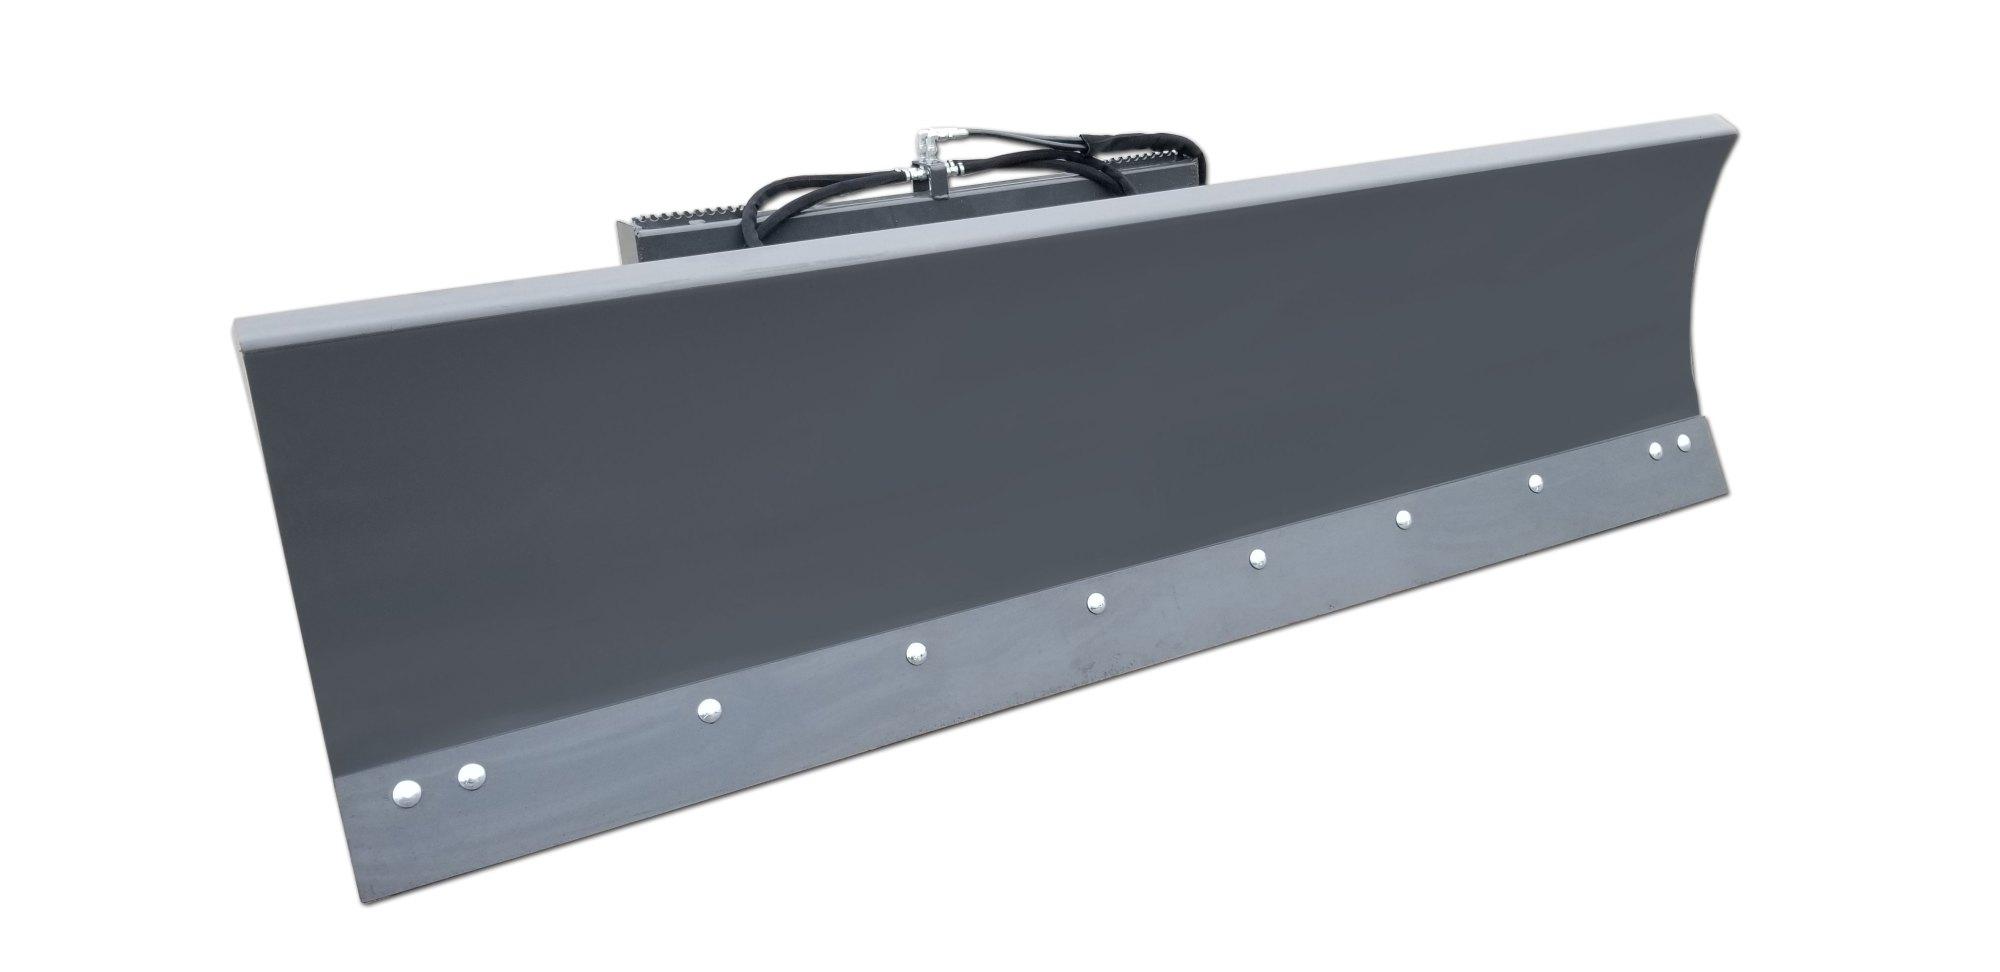 hight resolution of operator manual skid steer 6 way 4 way dozer blade attachment